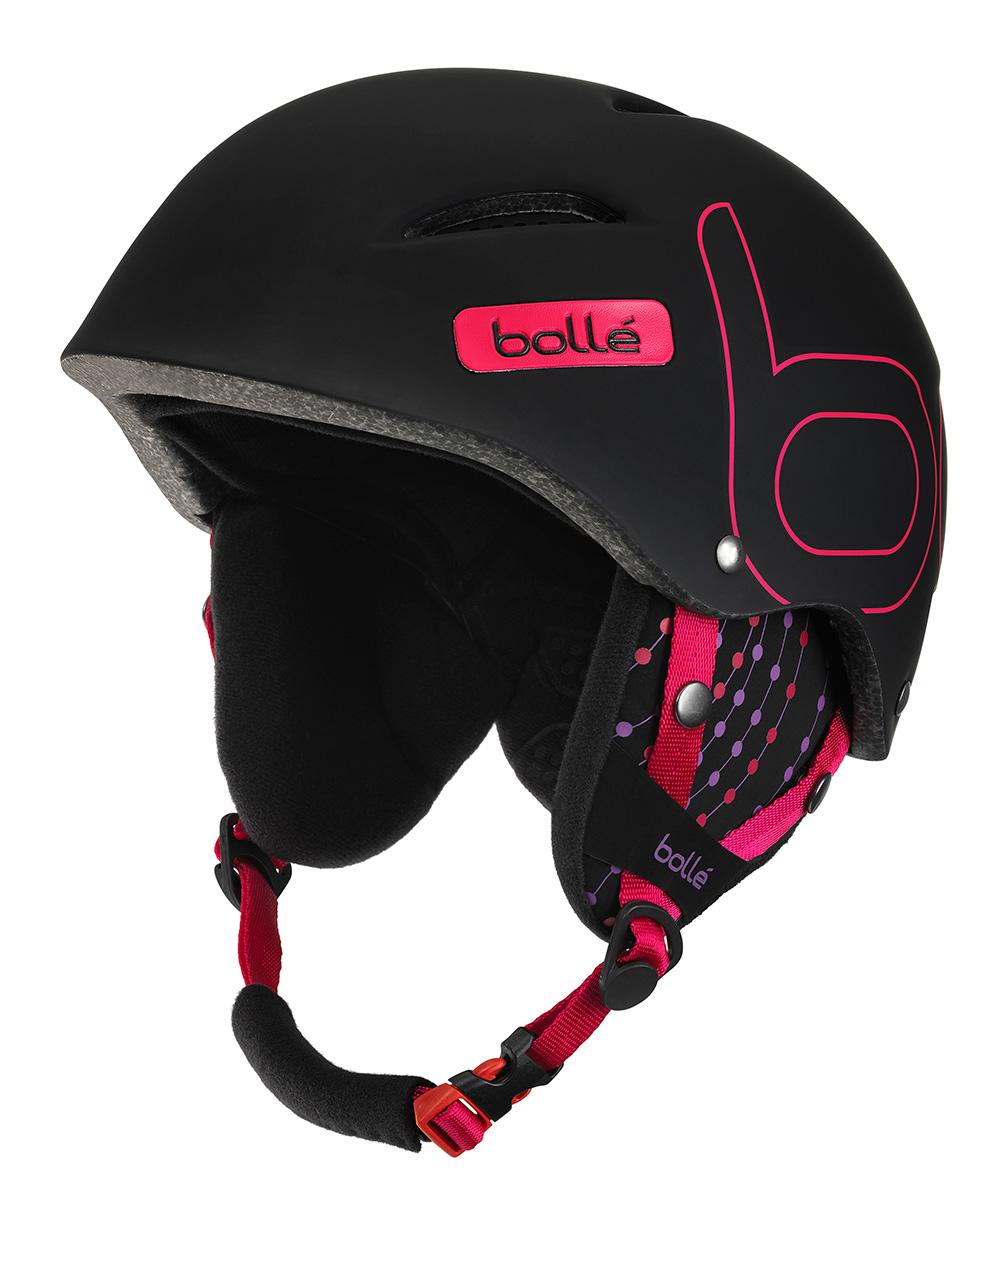 b-style_soft_black_pink_0